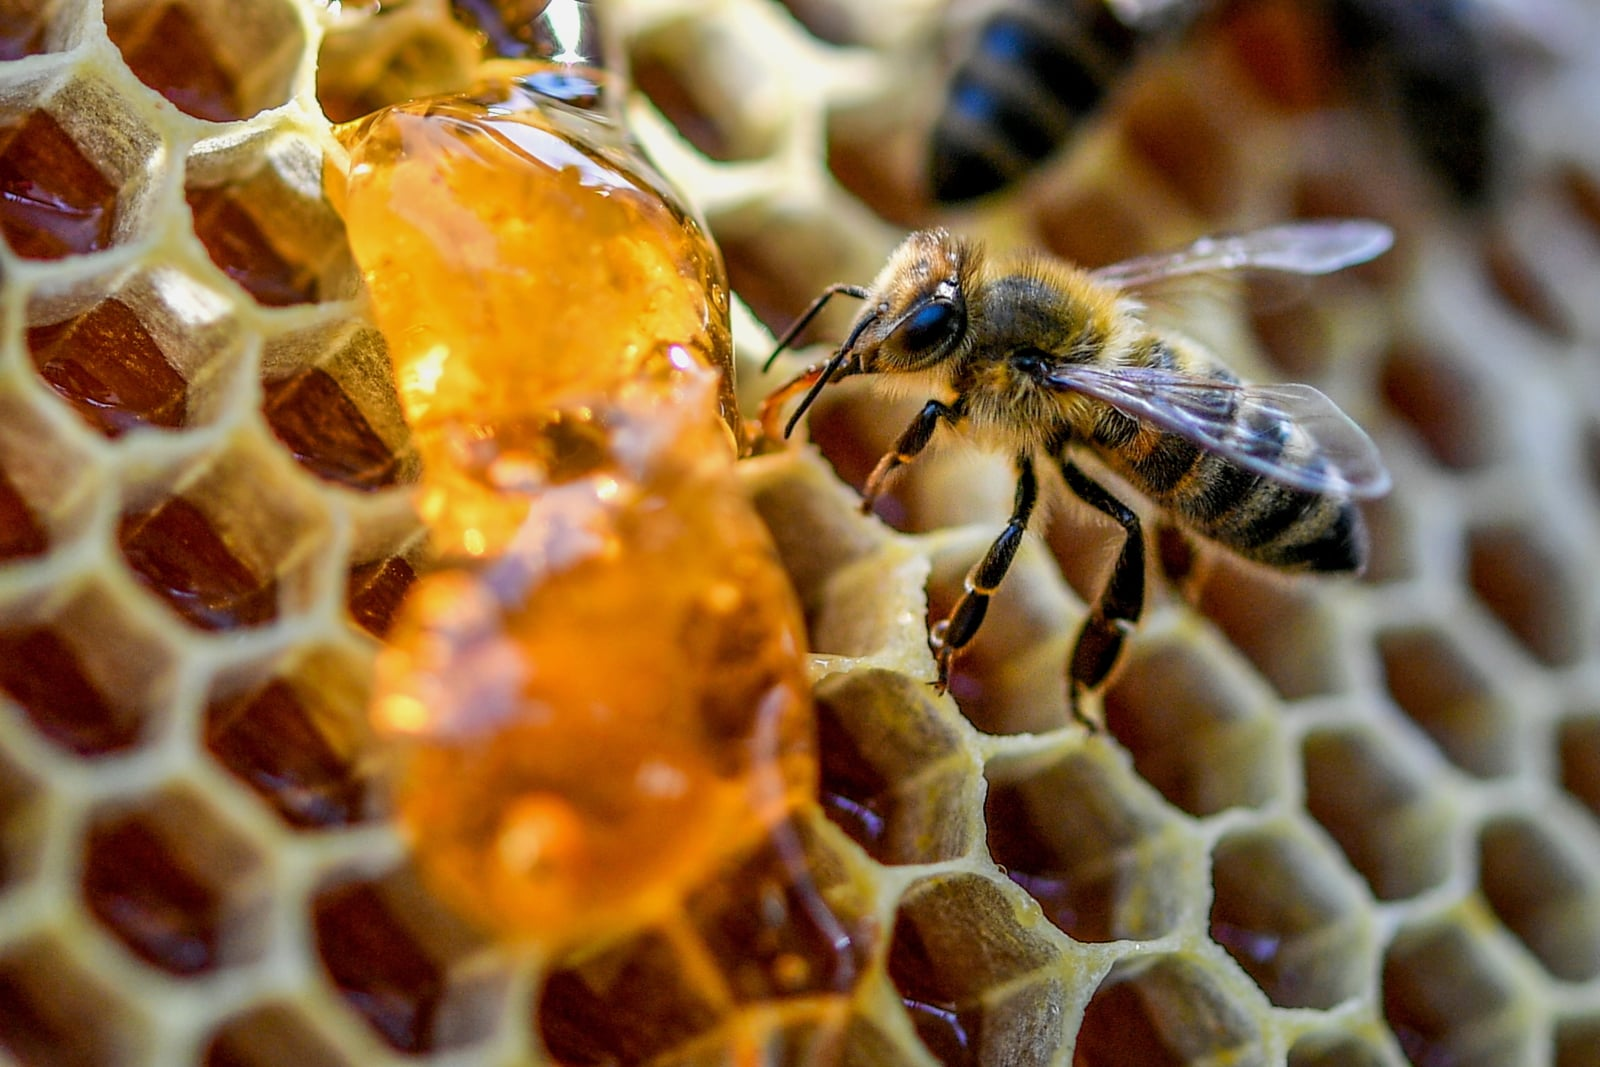 Pszczoły produkujące miód. fot. EPA/SASCHA STEINBACH